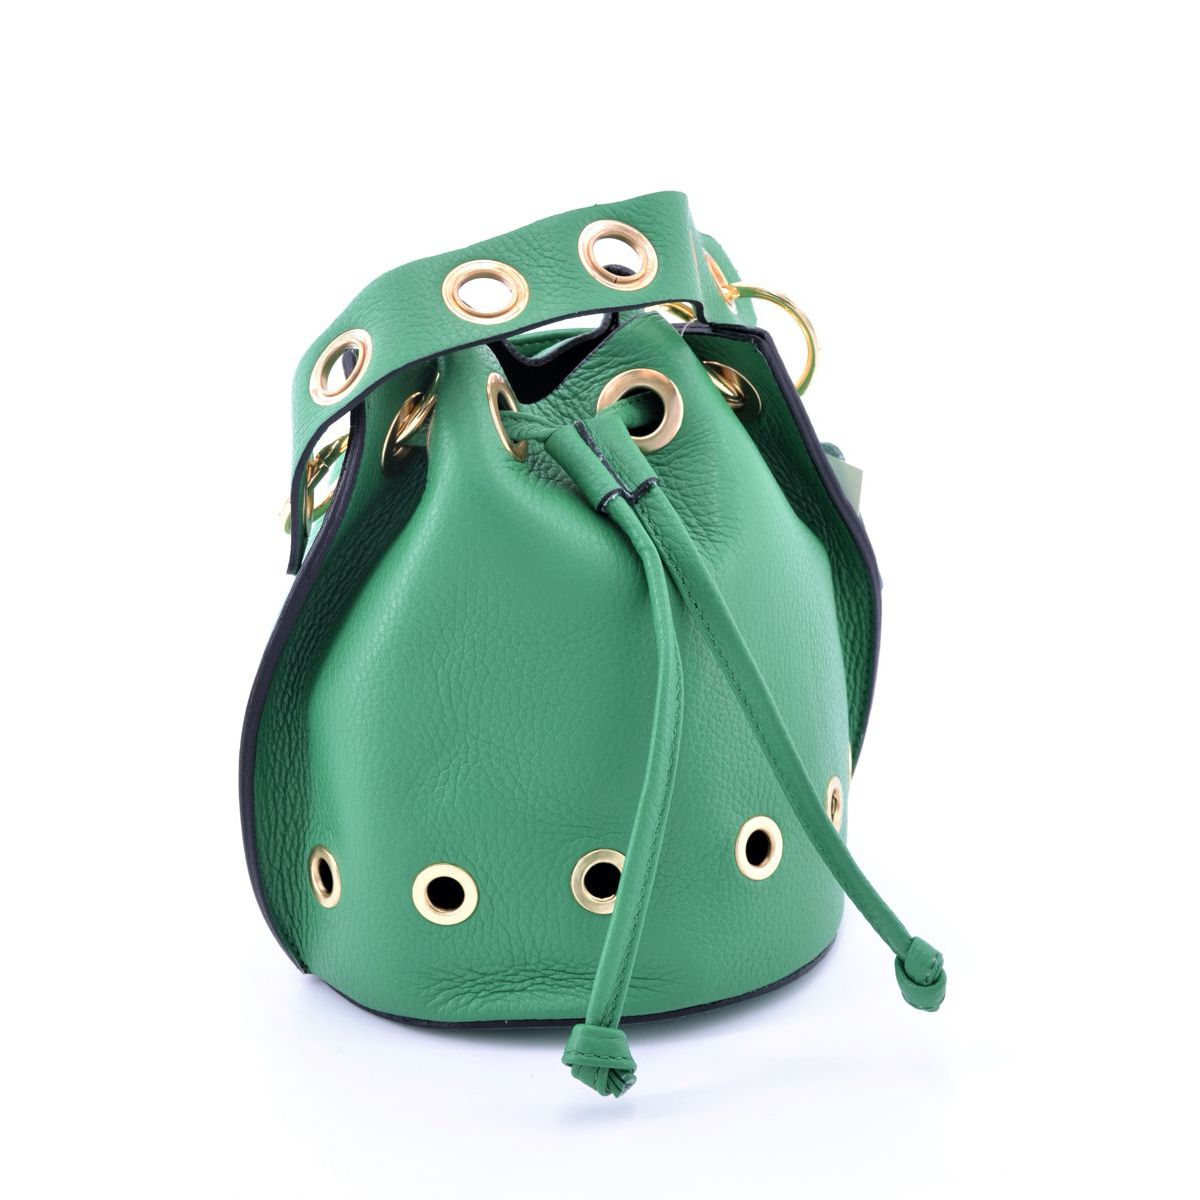 Mini leather bucket with shoulder strap Green BRASS Workshop